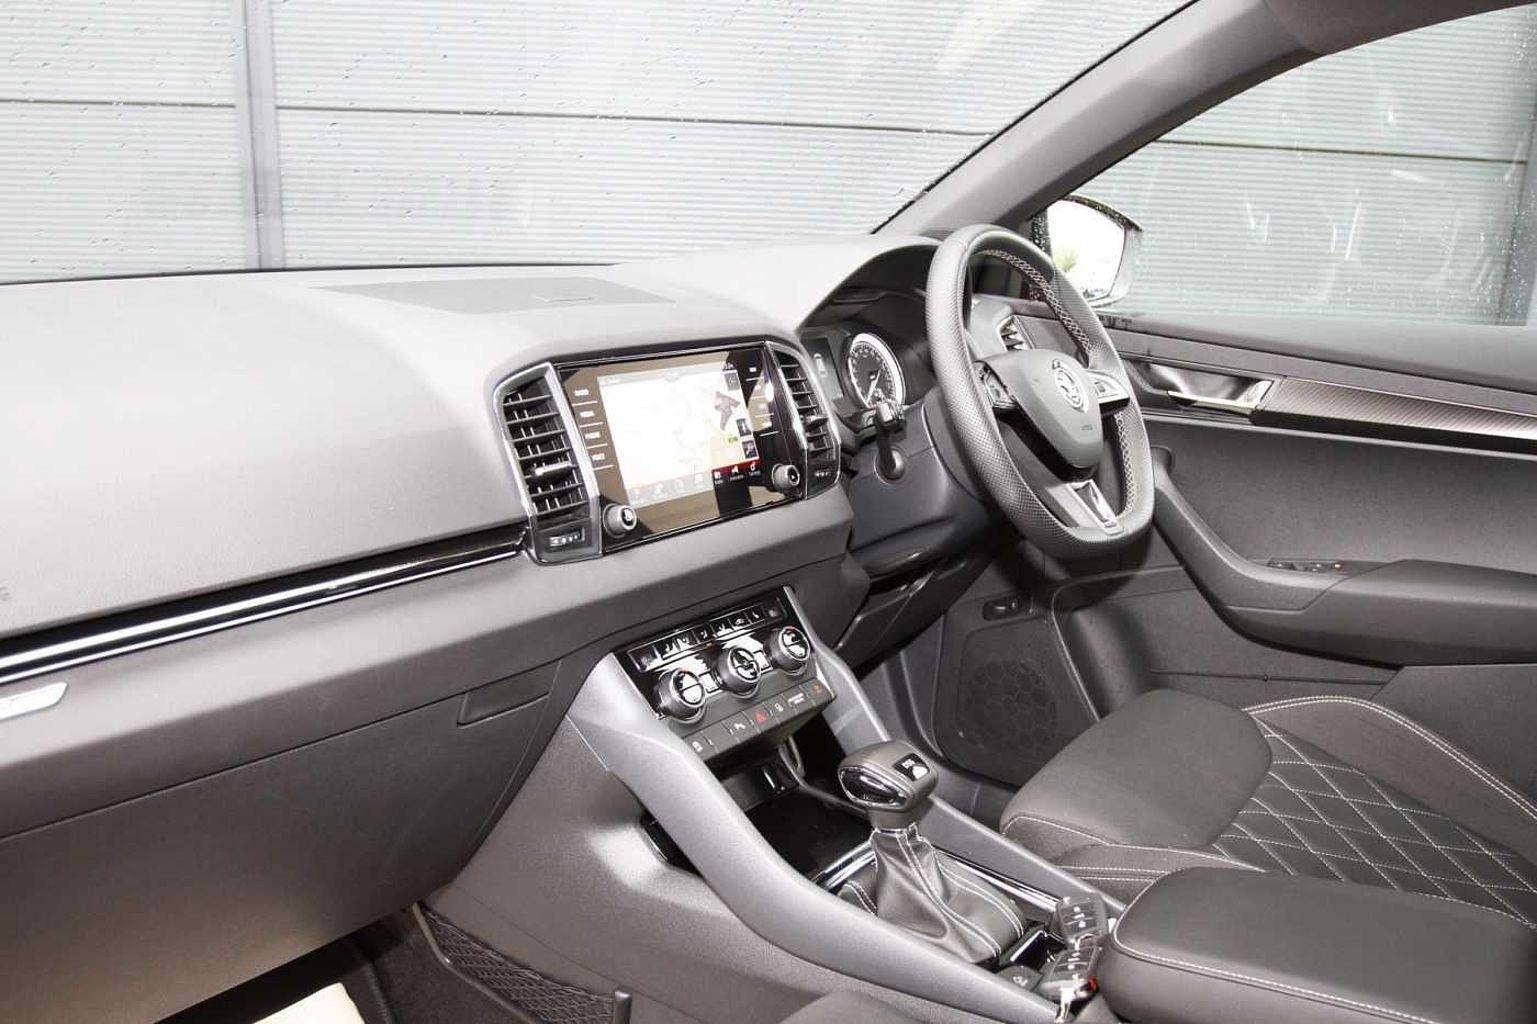 SKODA Karoq SUV 2.0TDI (150ps) 4X4 SportLine SCR DSG